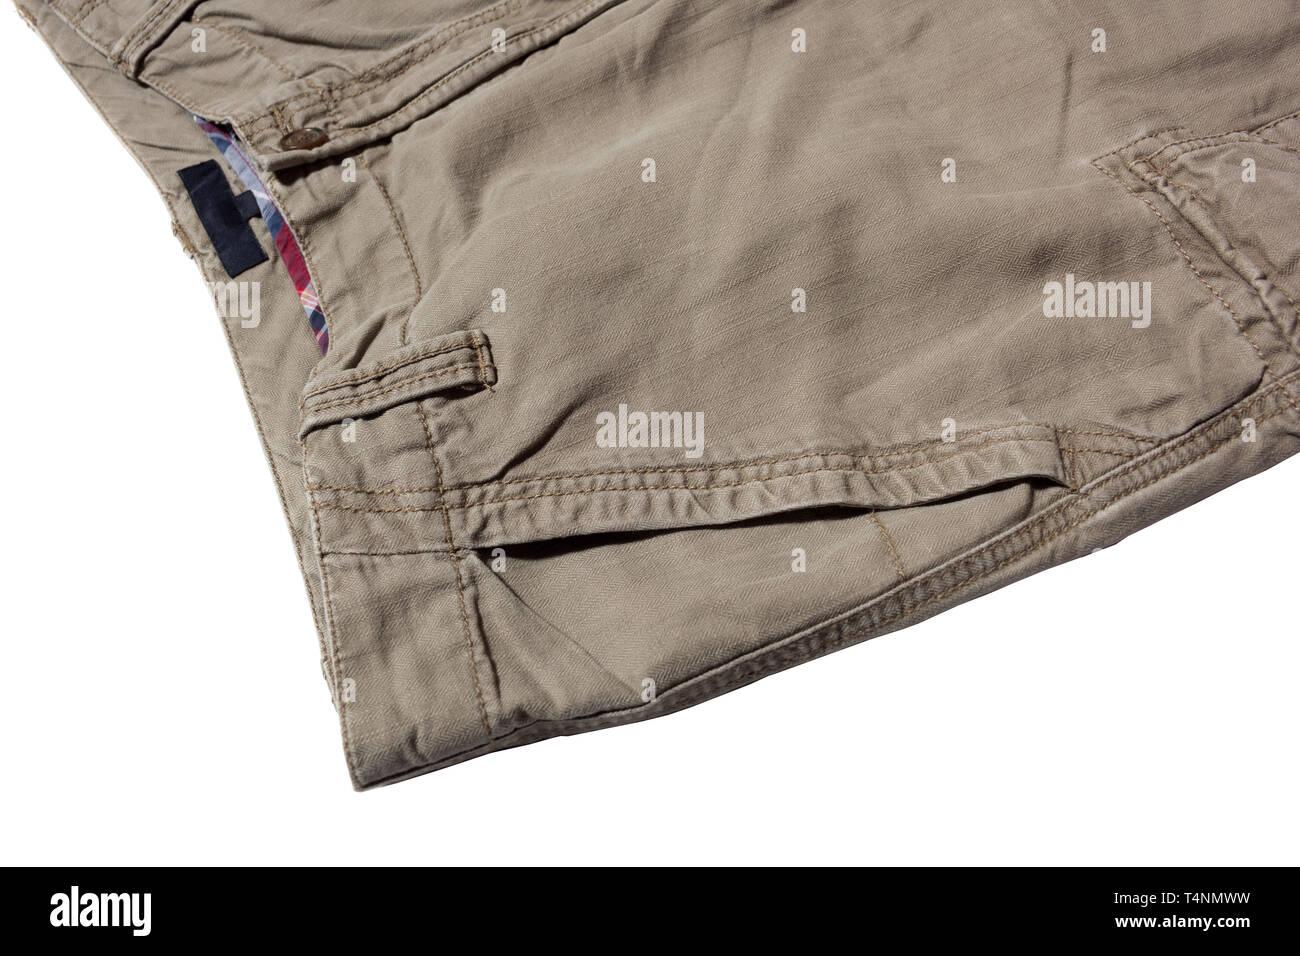 men's linen trousers - Stock Image